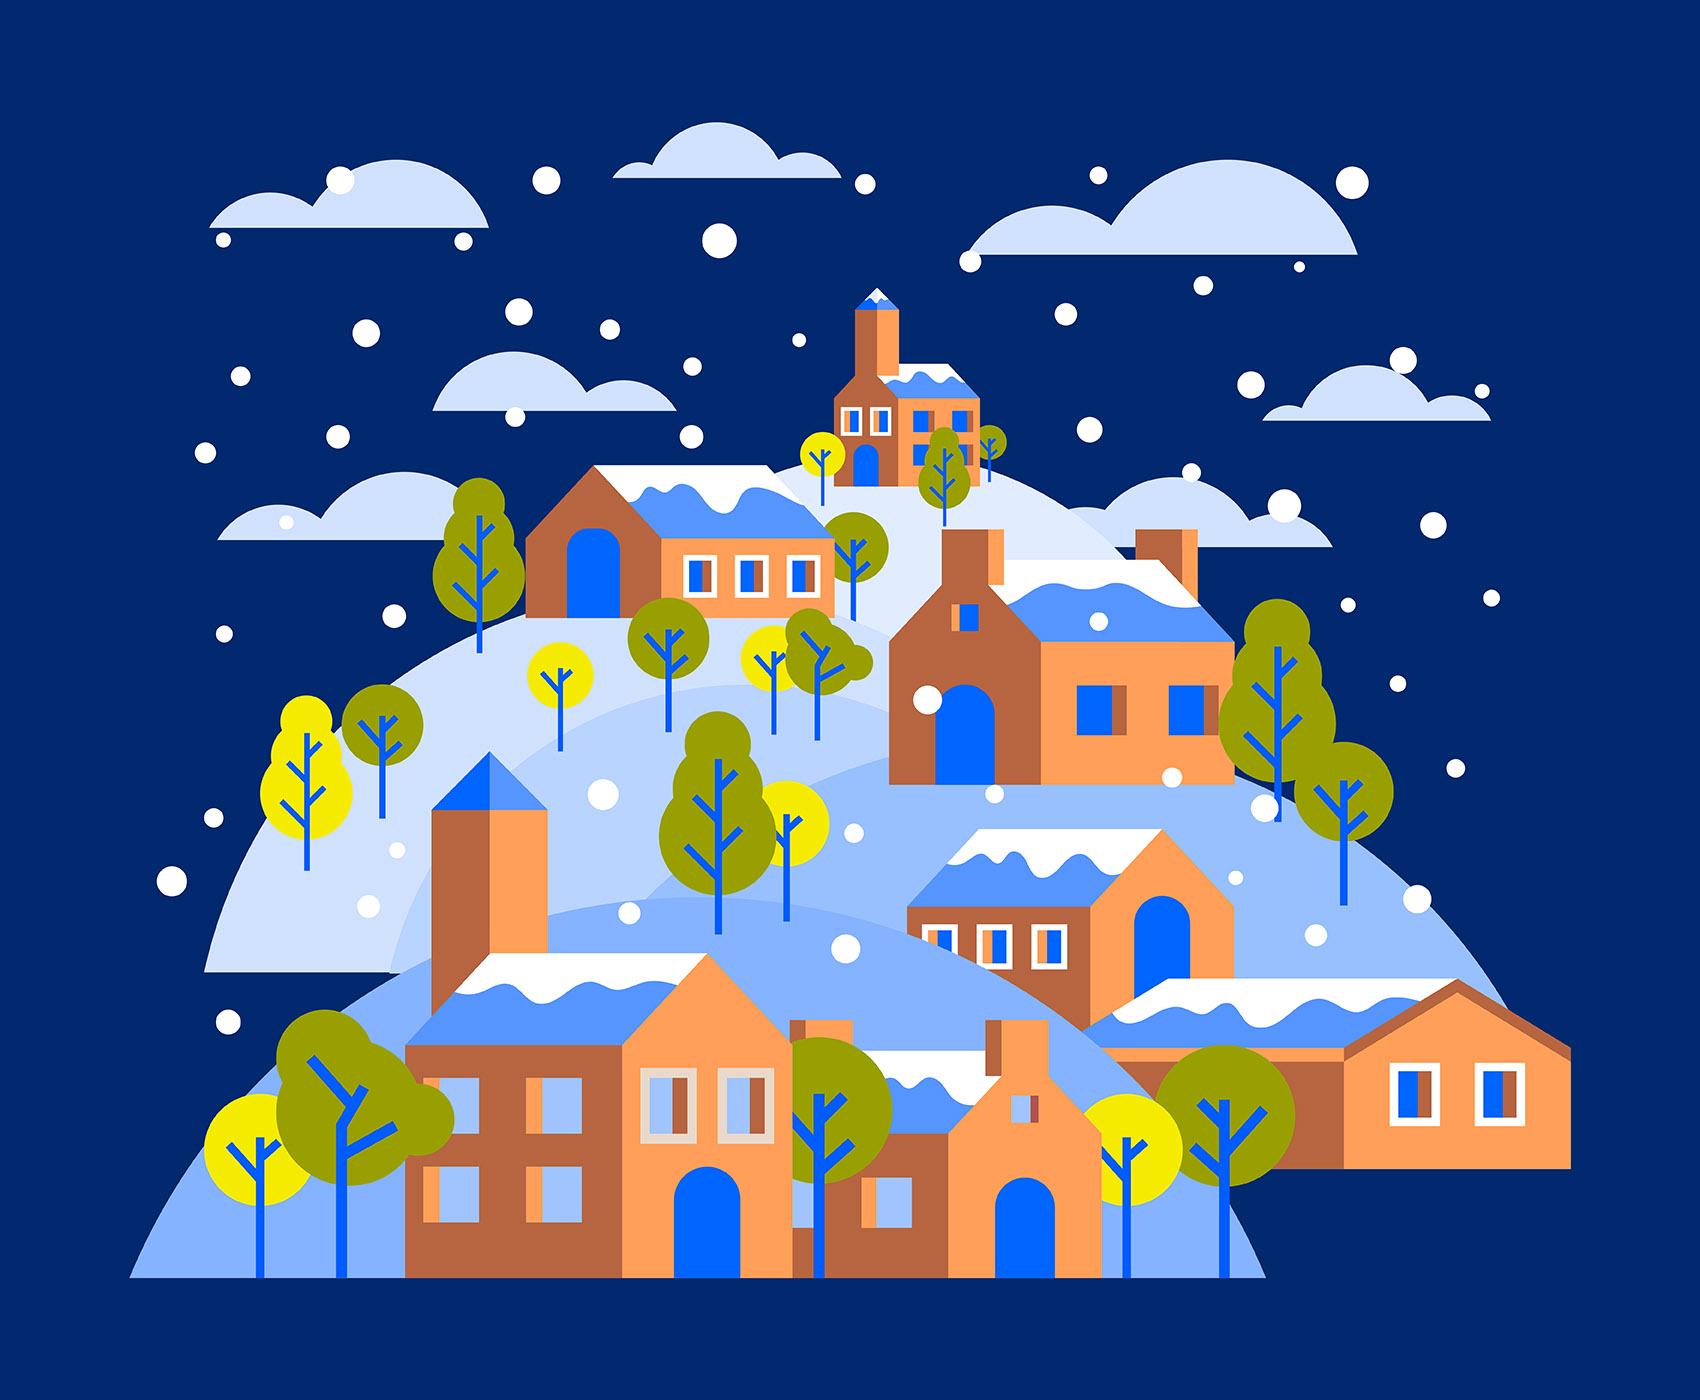 Winter Village Illustration - Download Free Vectors ...